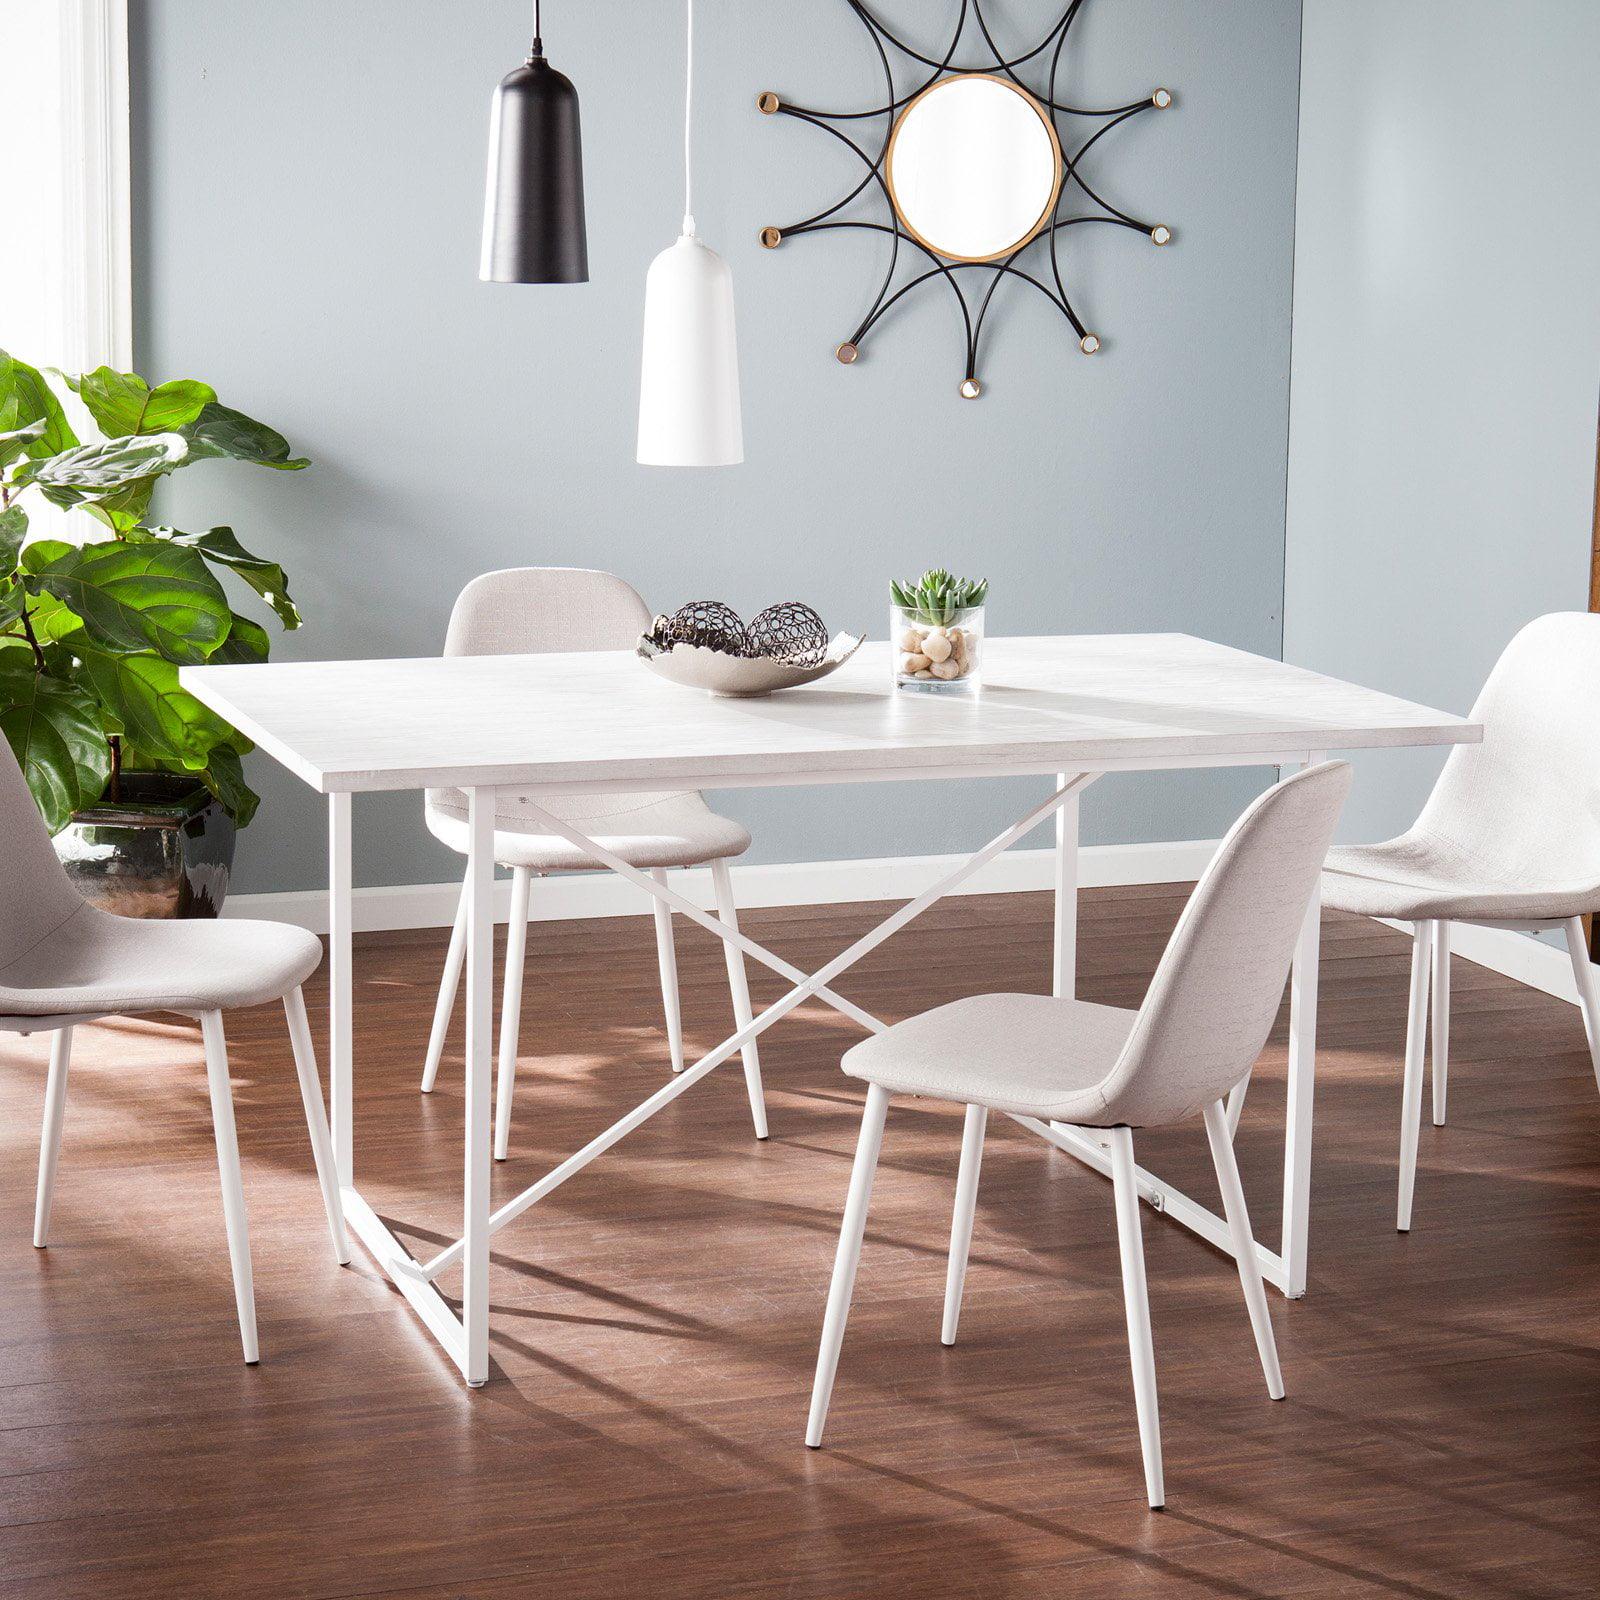 Southern Enterprises Coronado Dining Table